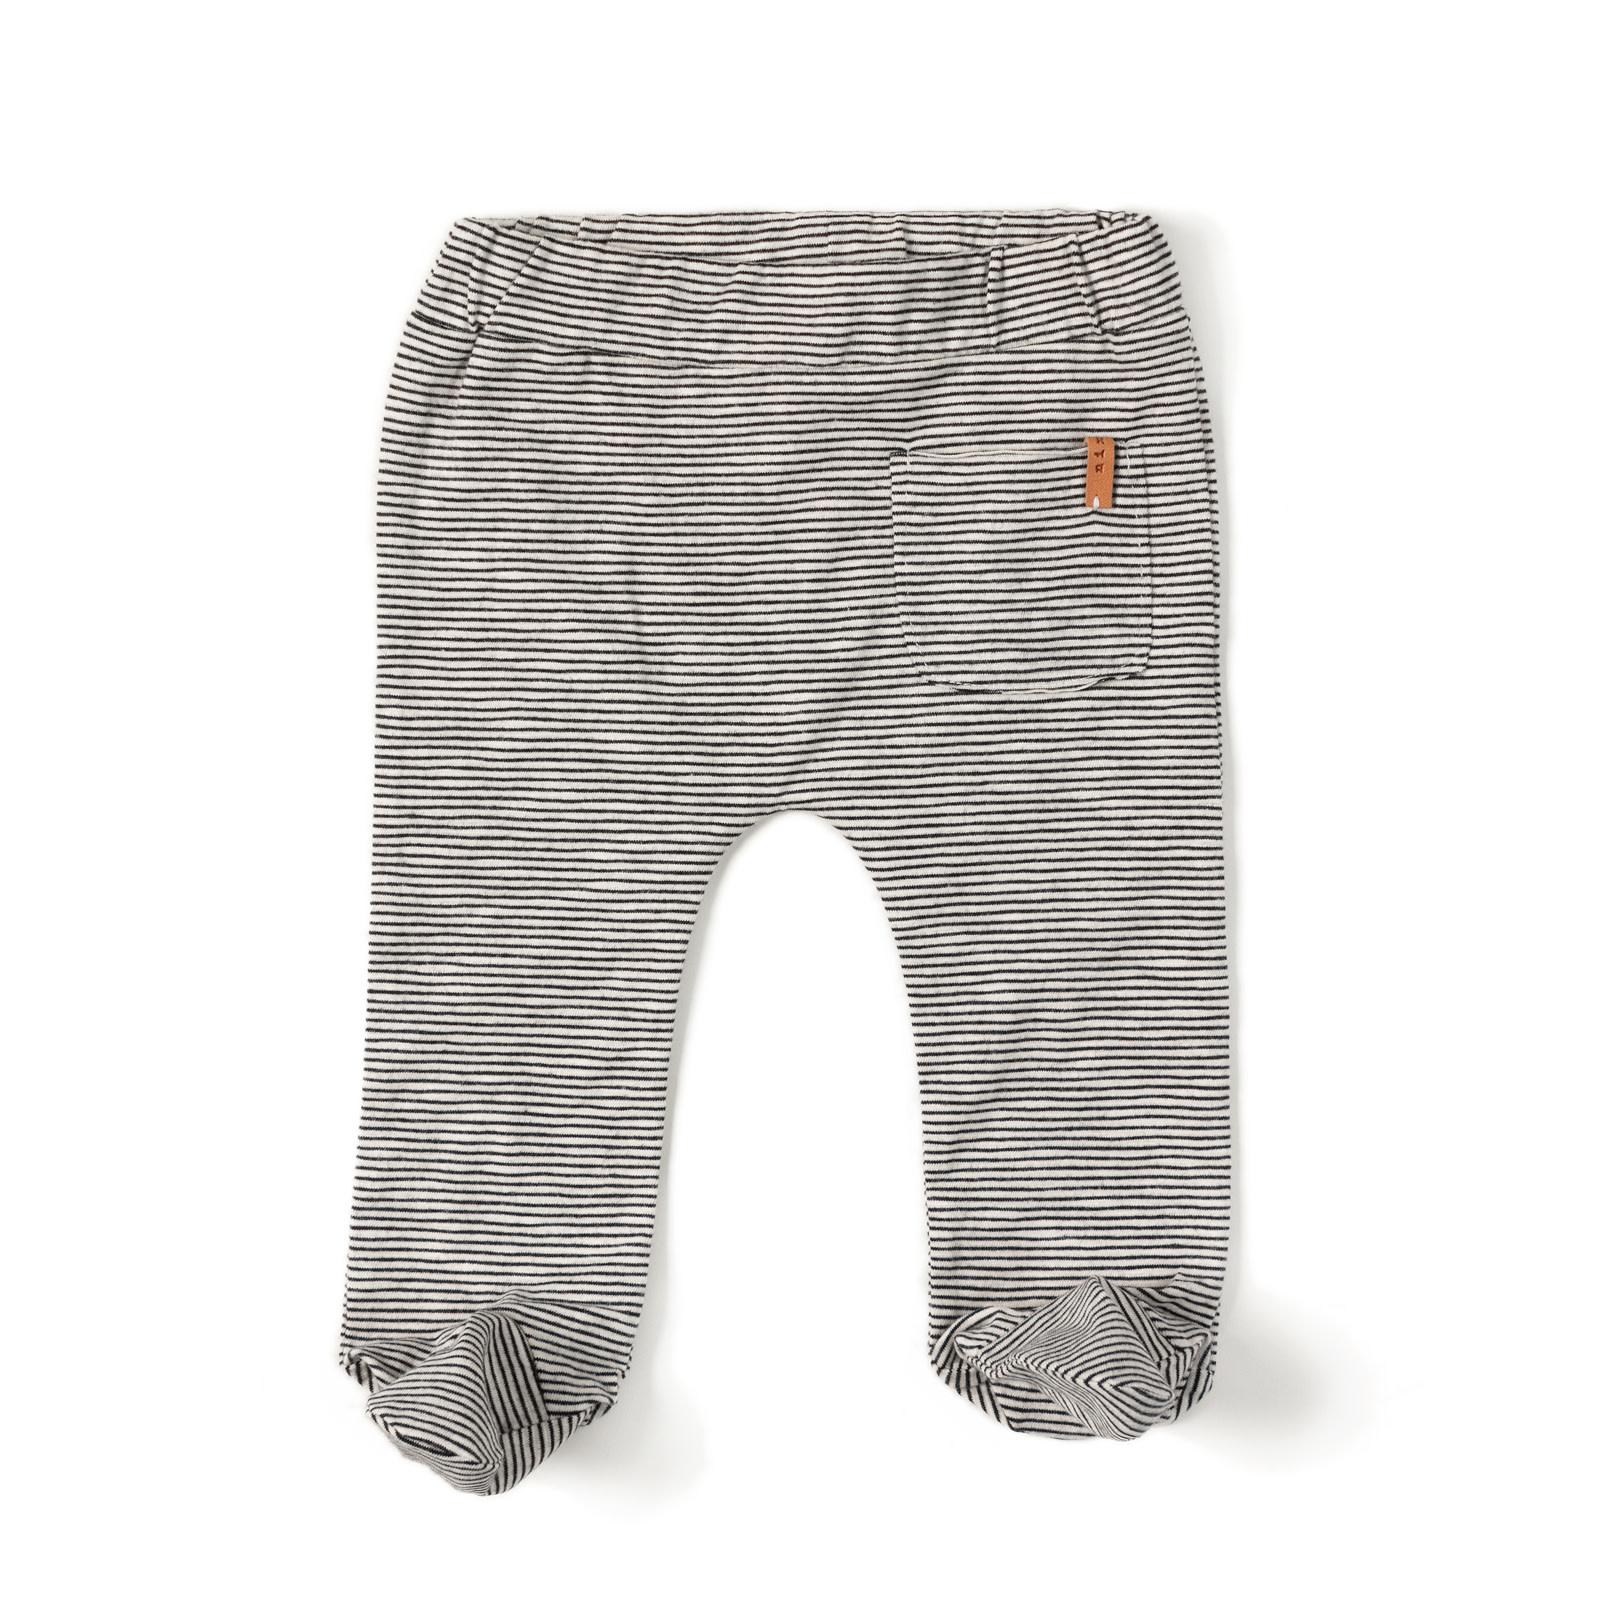 Nixnut Nixnut - Footie Legging Stripe